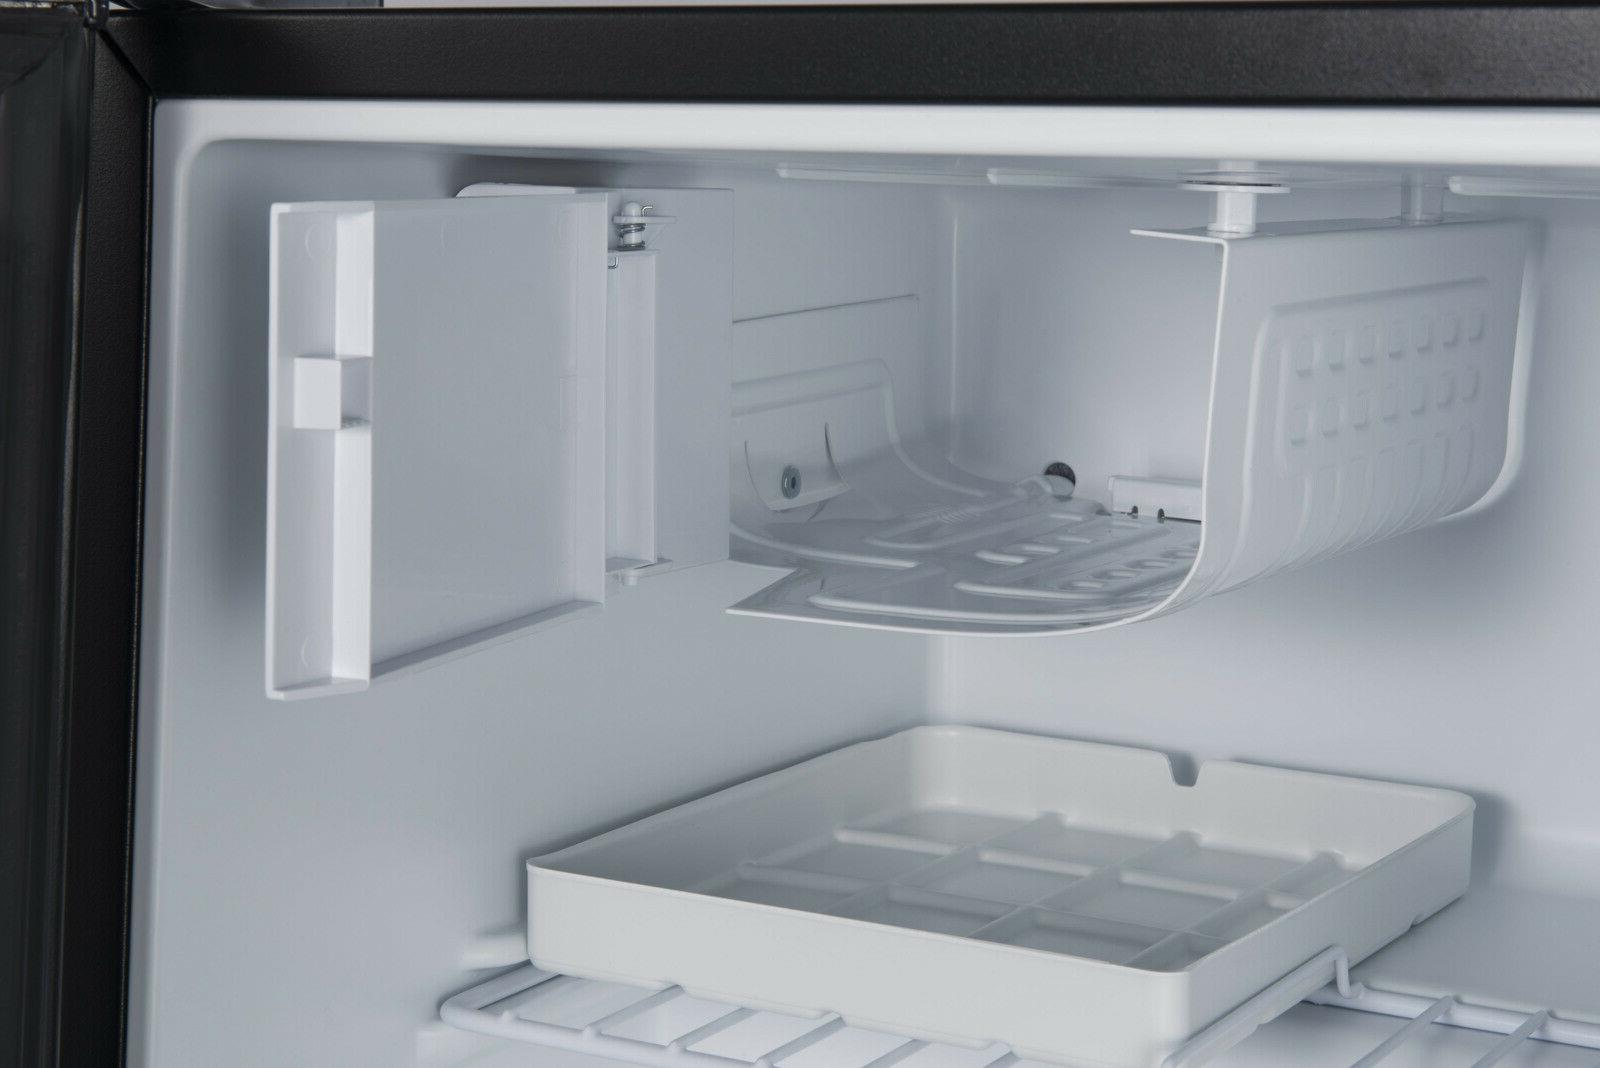 Mini Fridge 1.7 Cu Office Cooler Ref Party